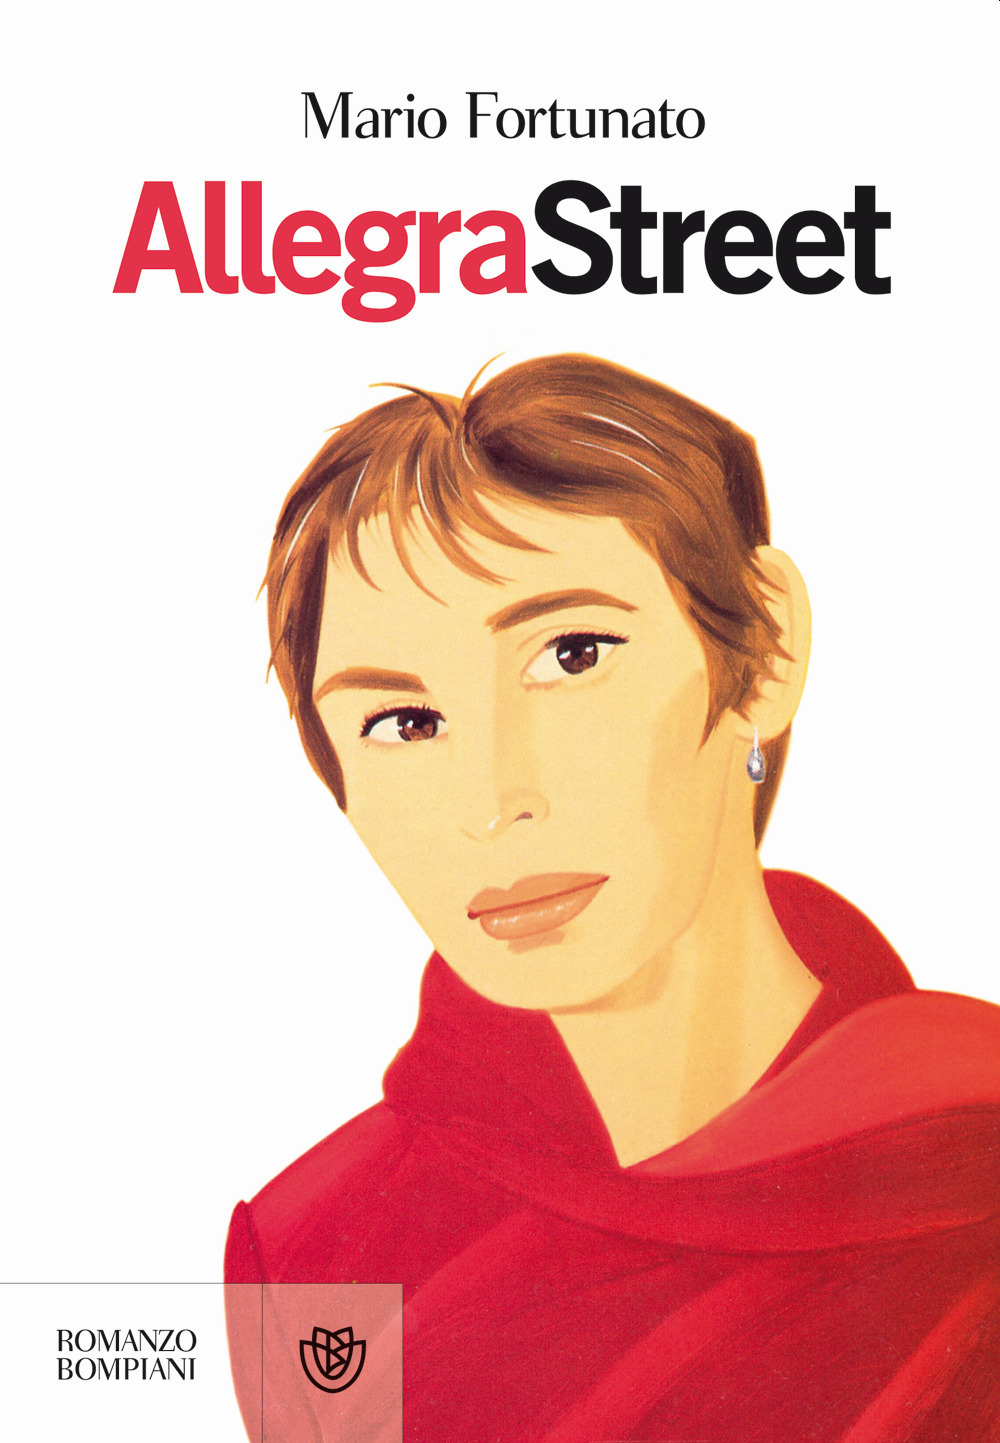 ALLEGRA STREET - 9788845201097